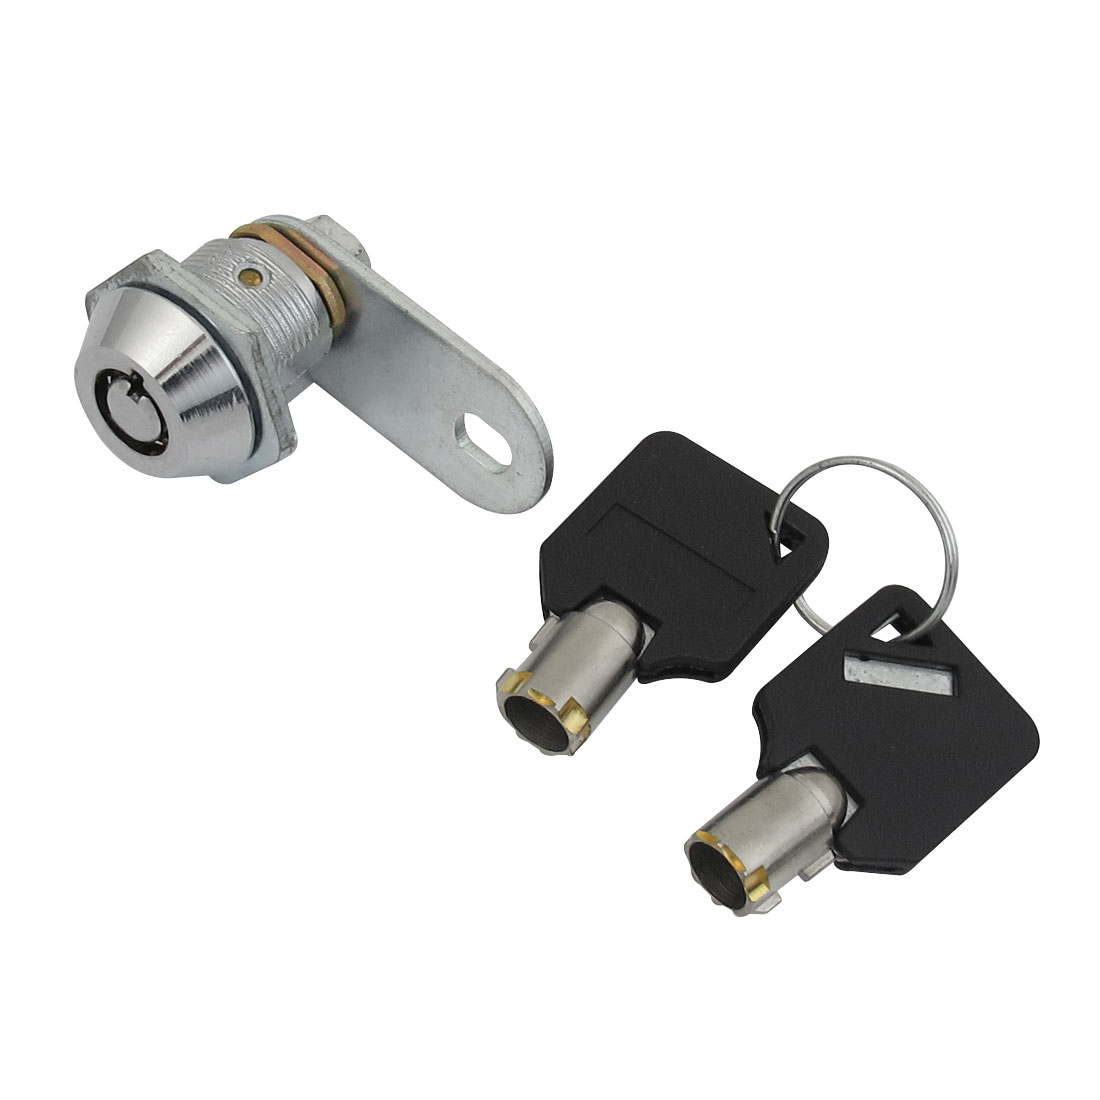 Silver Tone 18.5mm Thread Store Drawer Door Metal Plane Cam Lock